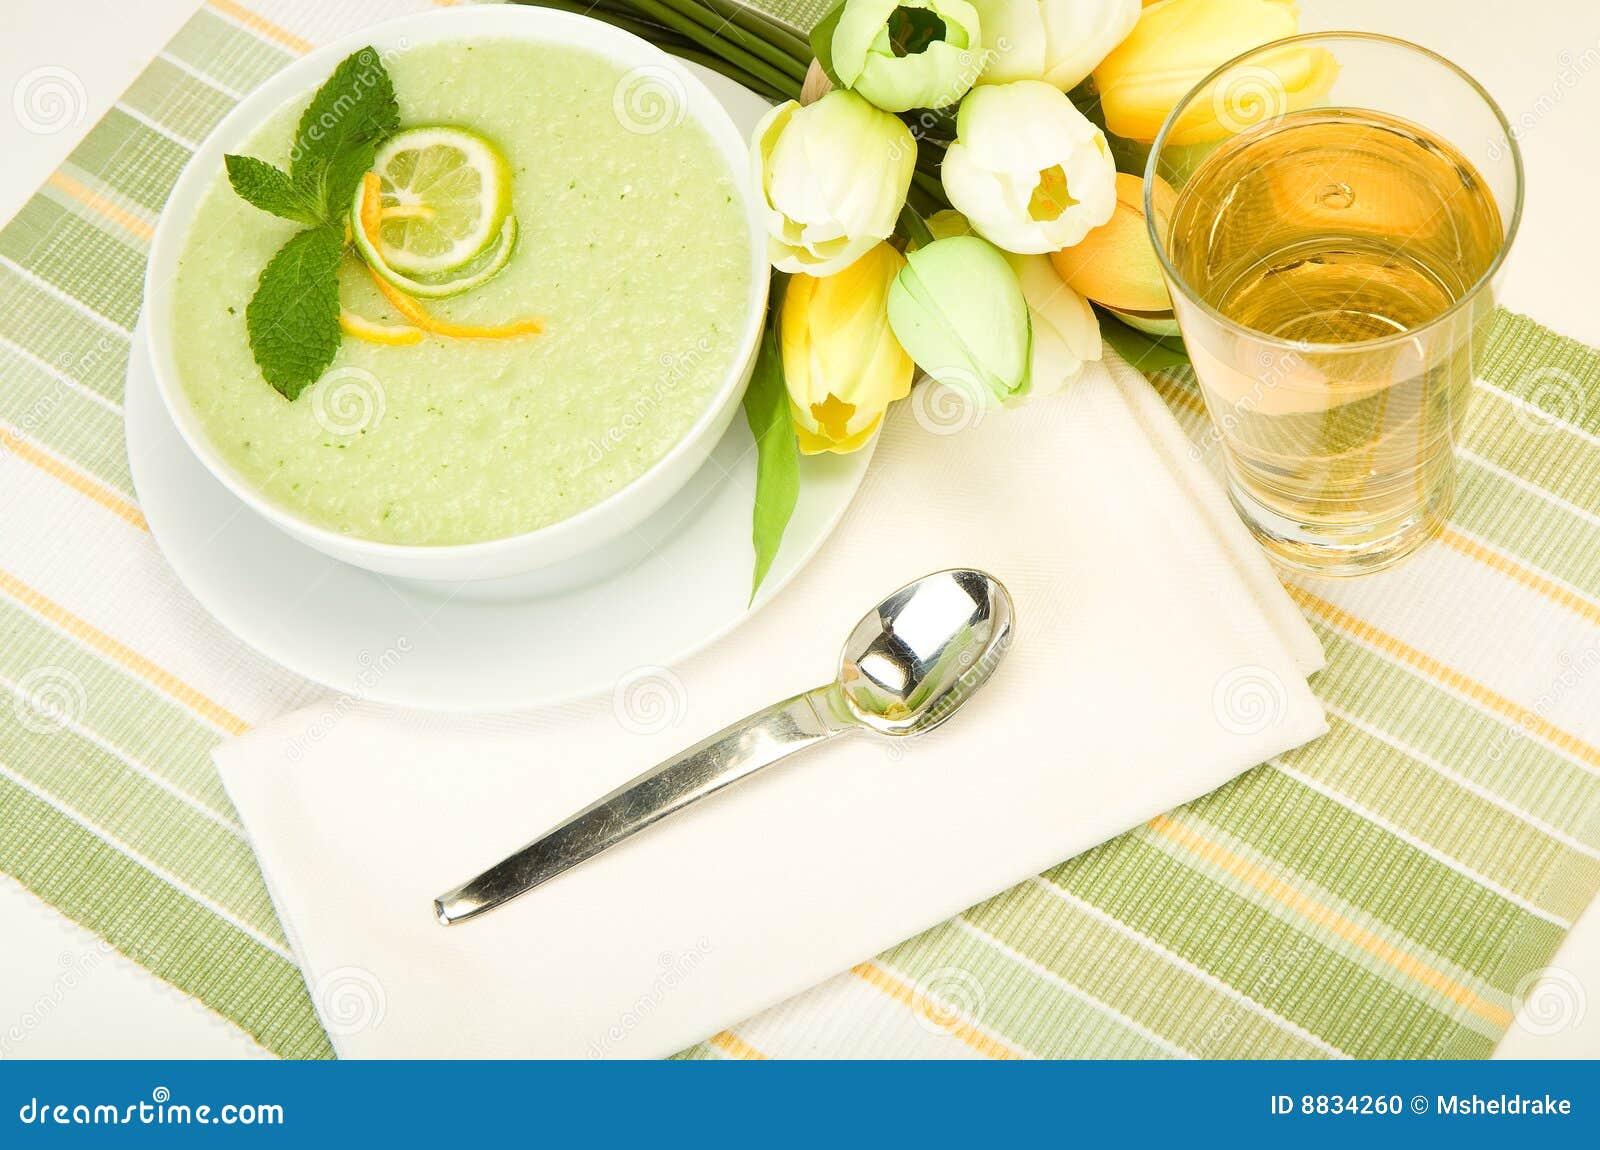 Cool Melon Soup Stock Photo - Image: 8834260